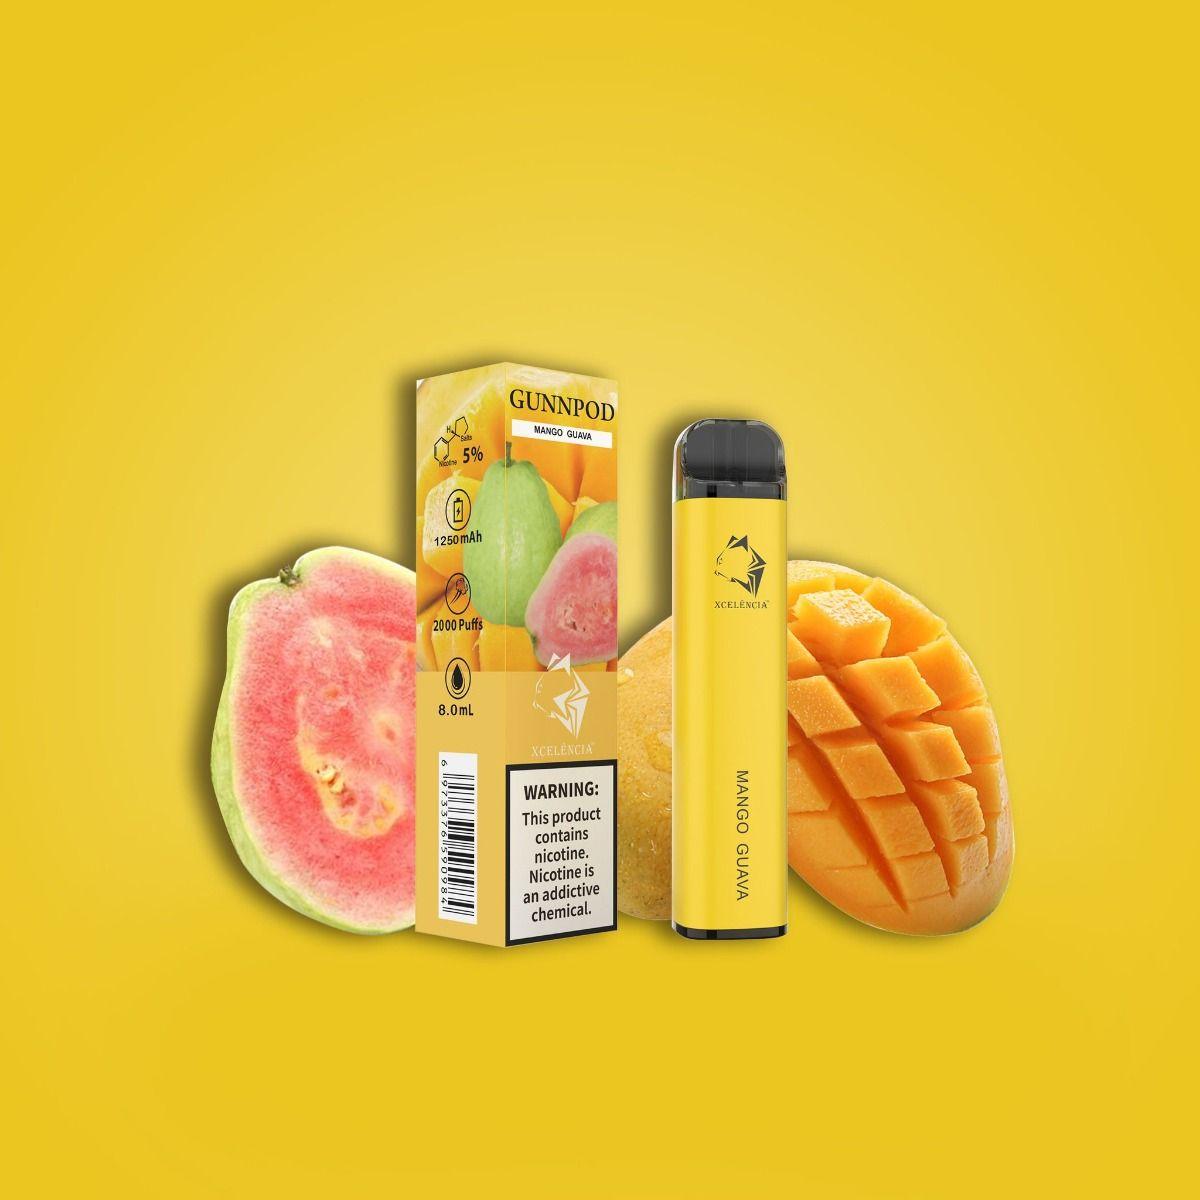 Gunnpod Disposable Vape With Nicotine 5% - Vape Electronics Vape Shop NZ